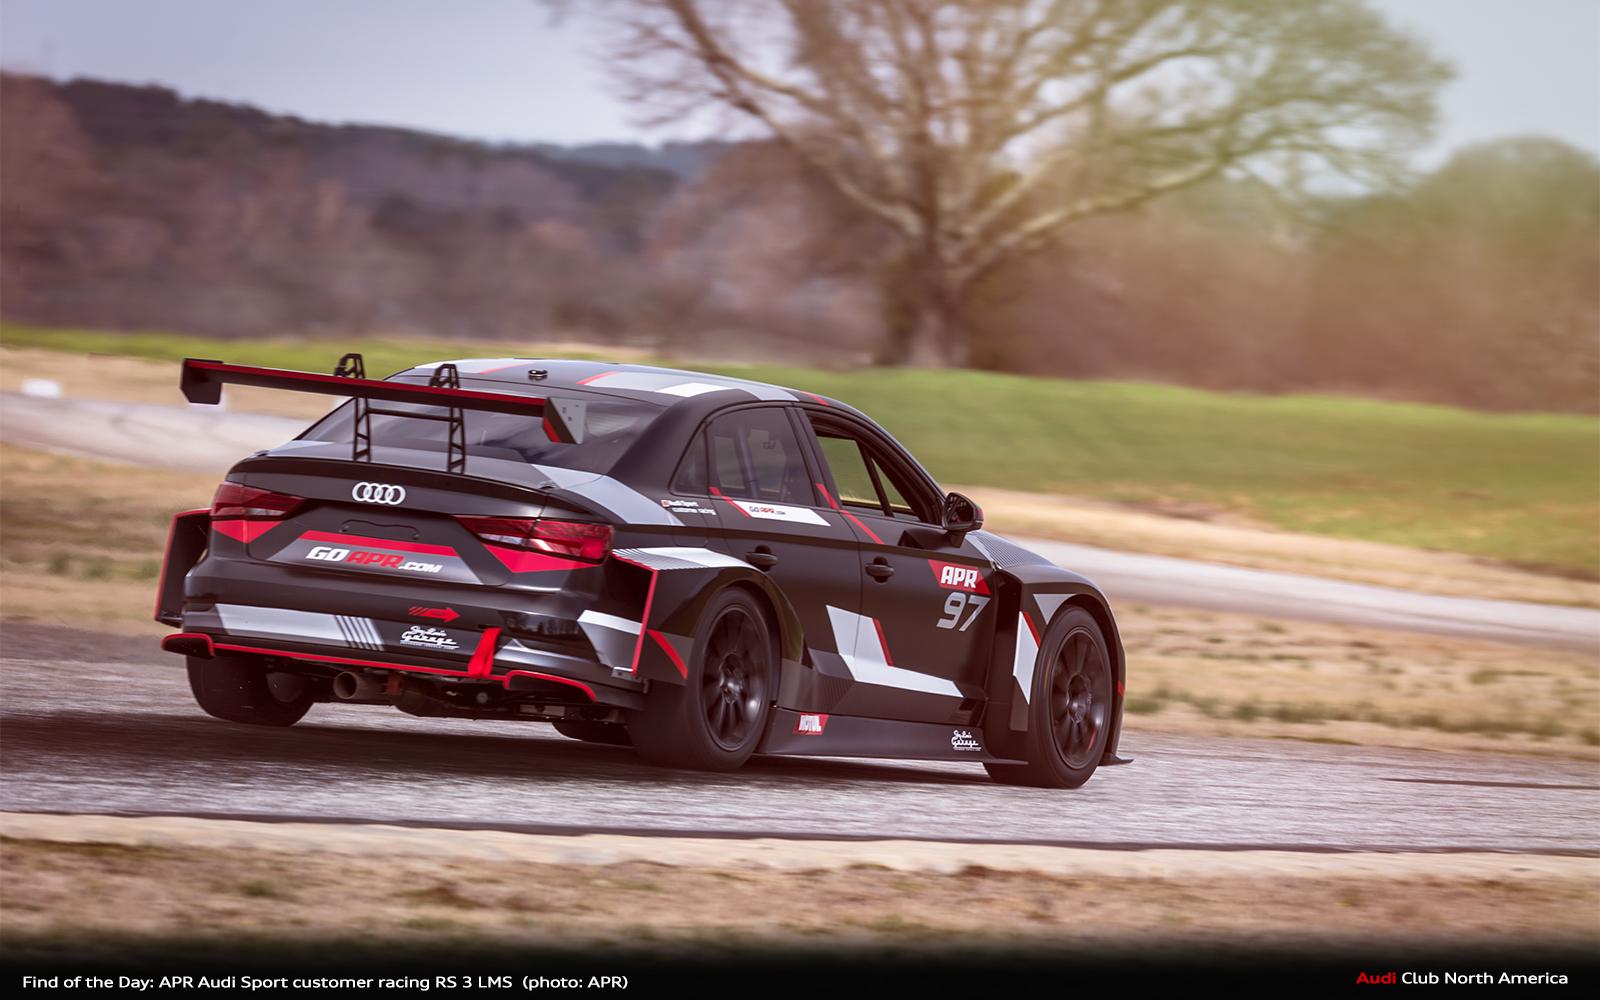 Kelebihan Audi Rs3 Lms Tangguh